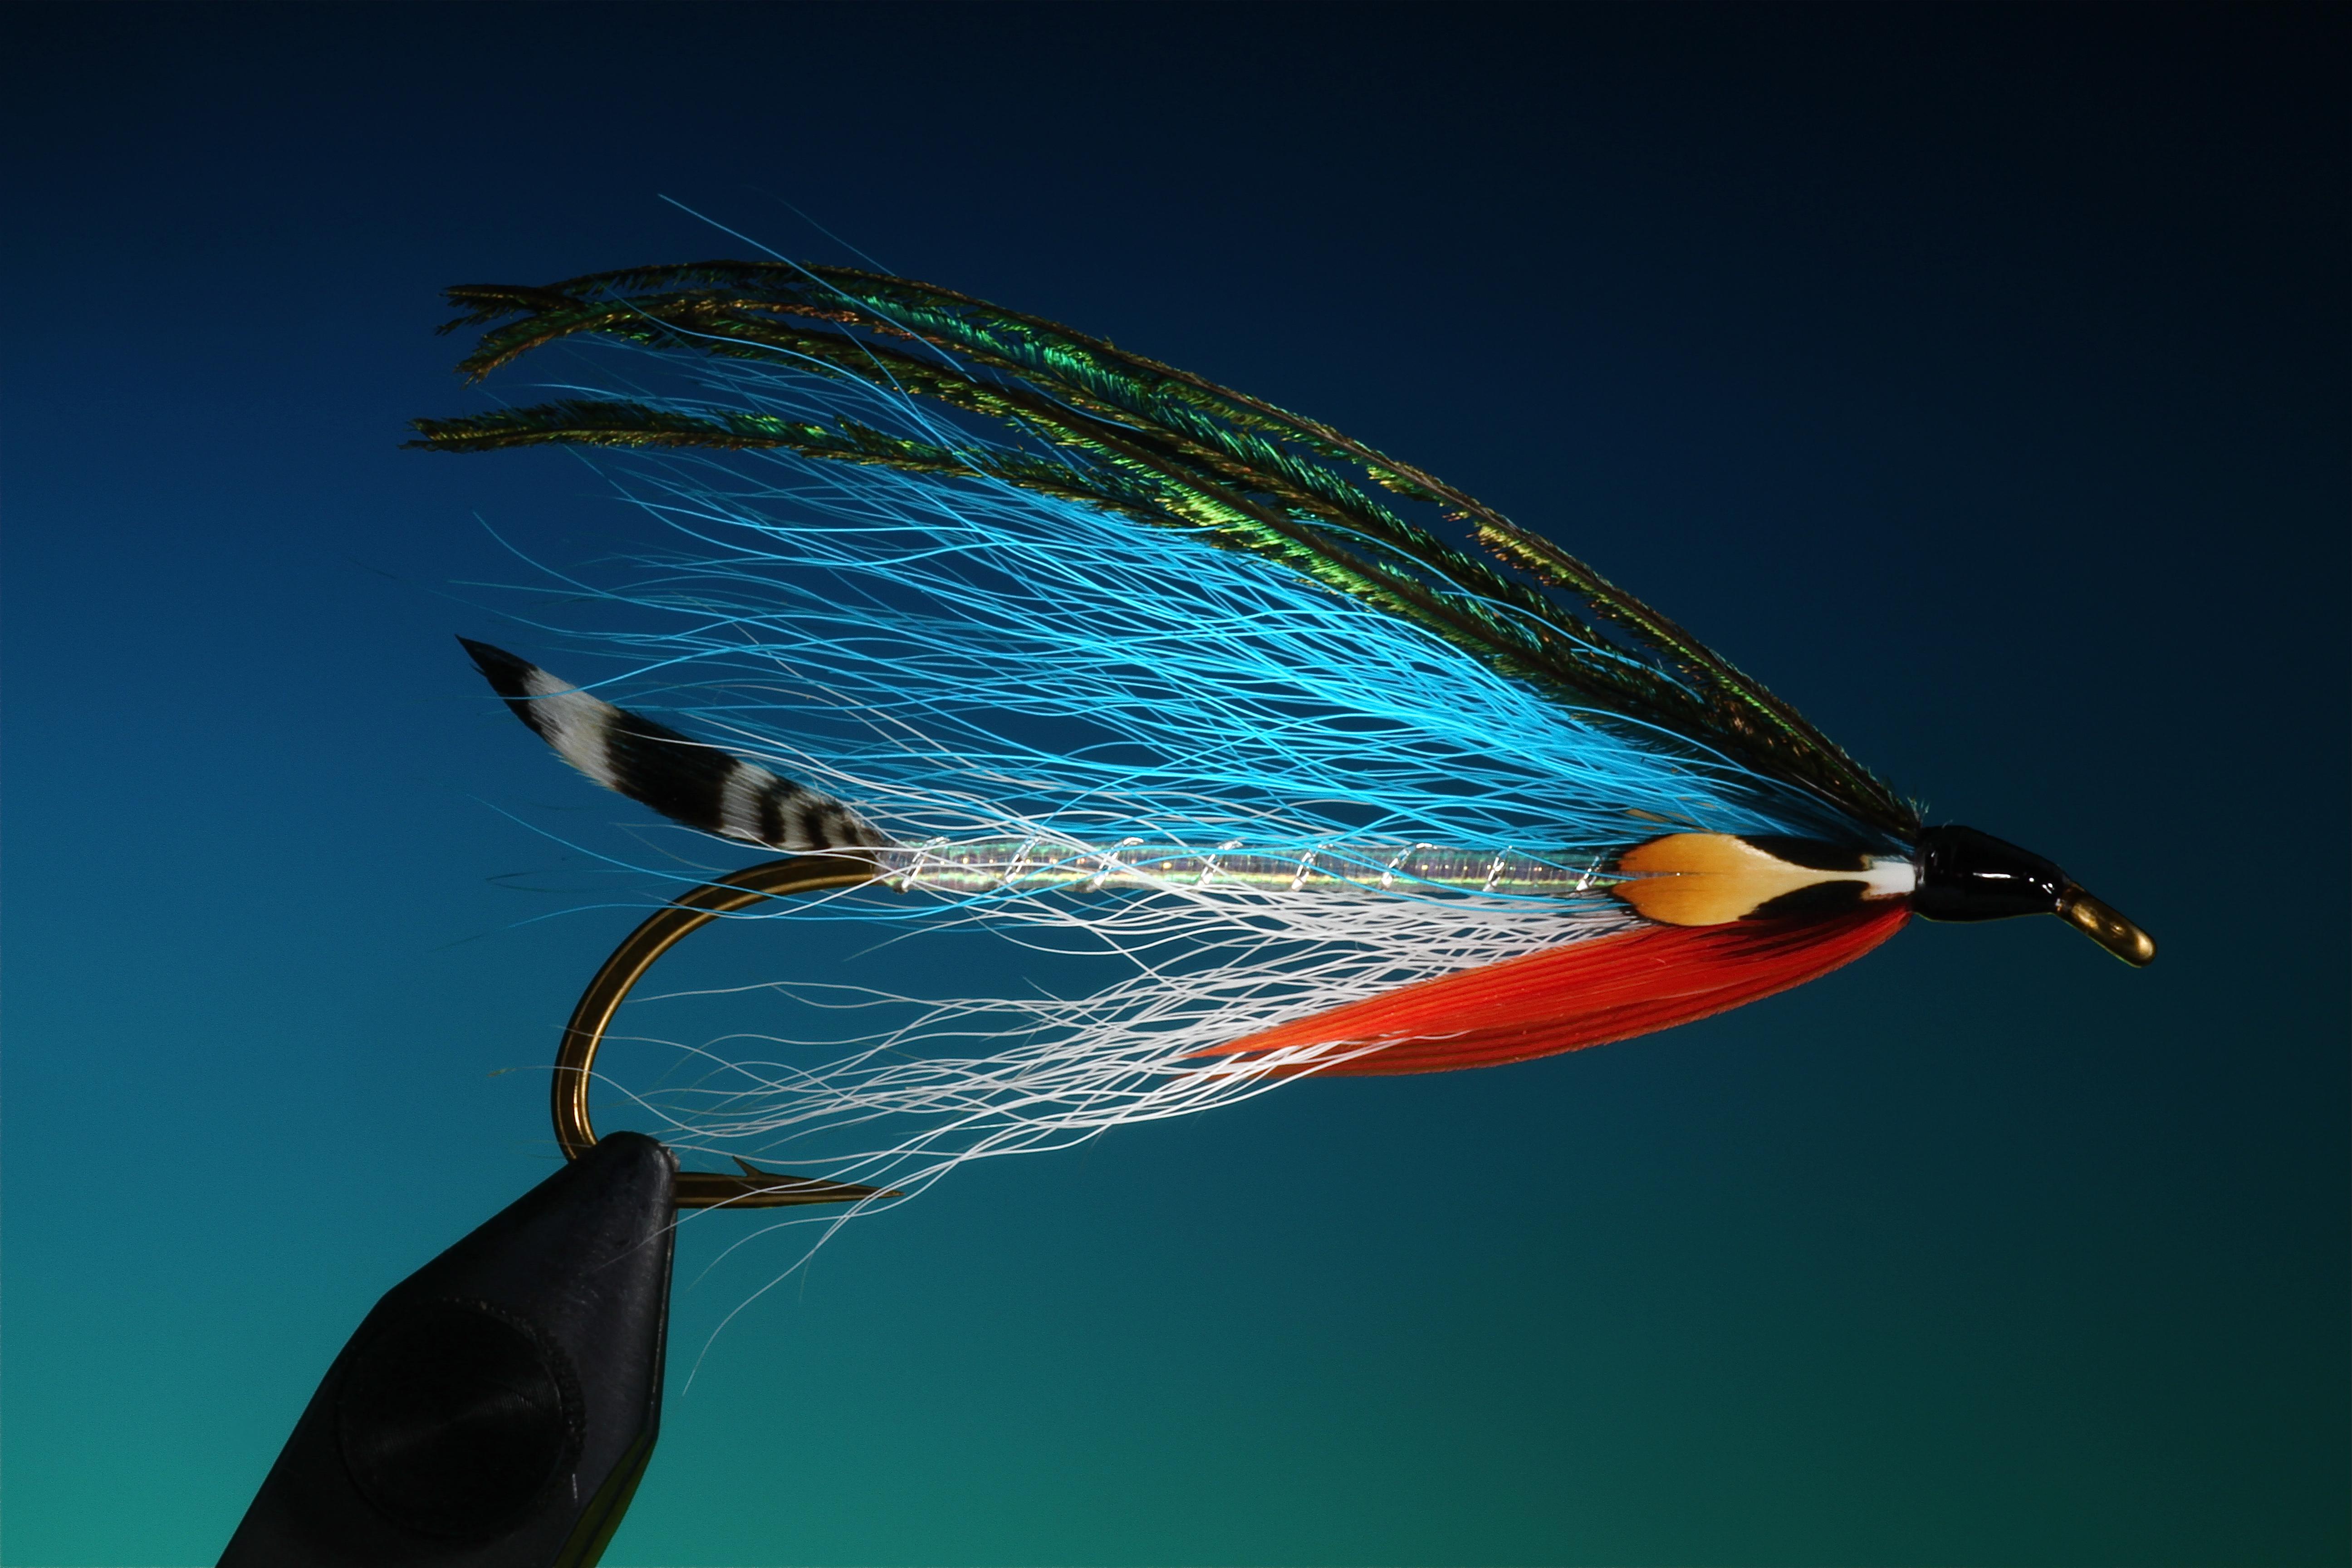 fly fishing flies - HD2100×1400